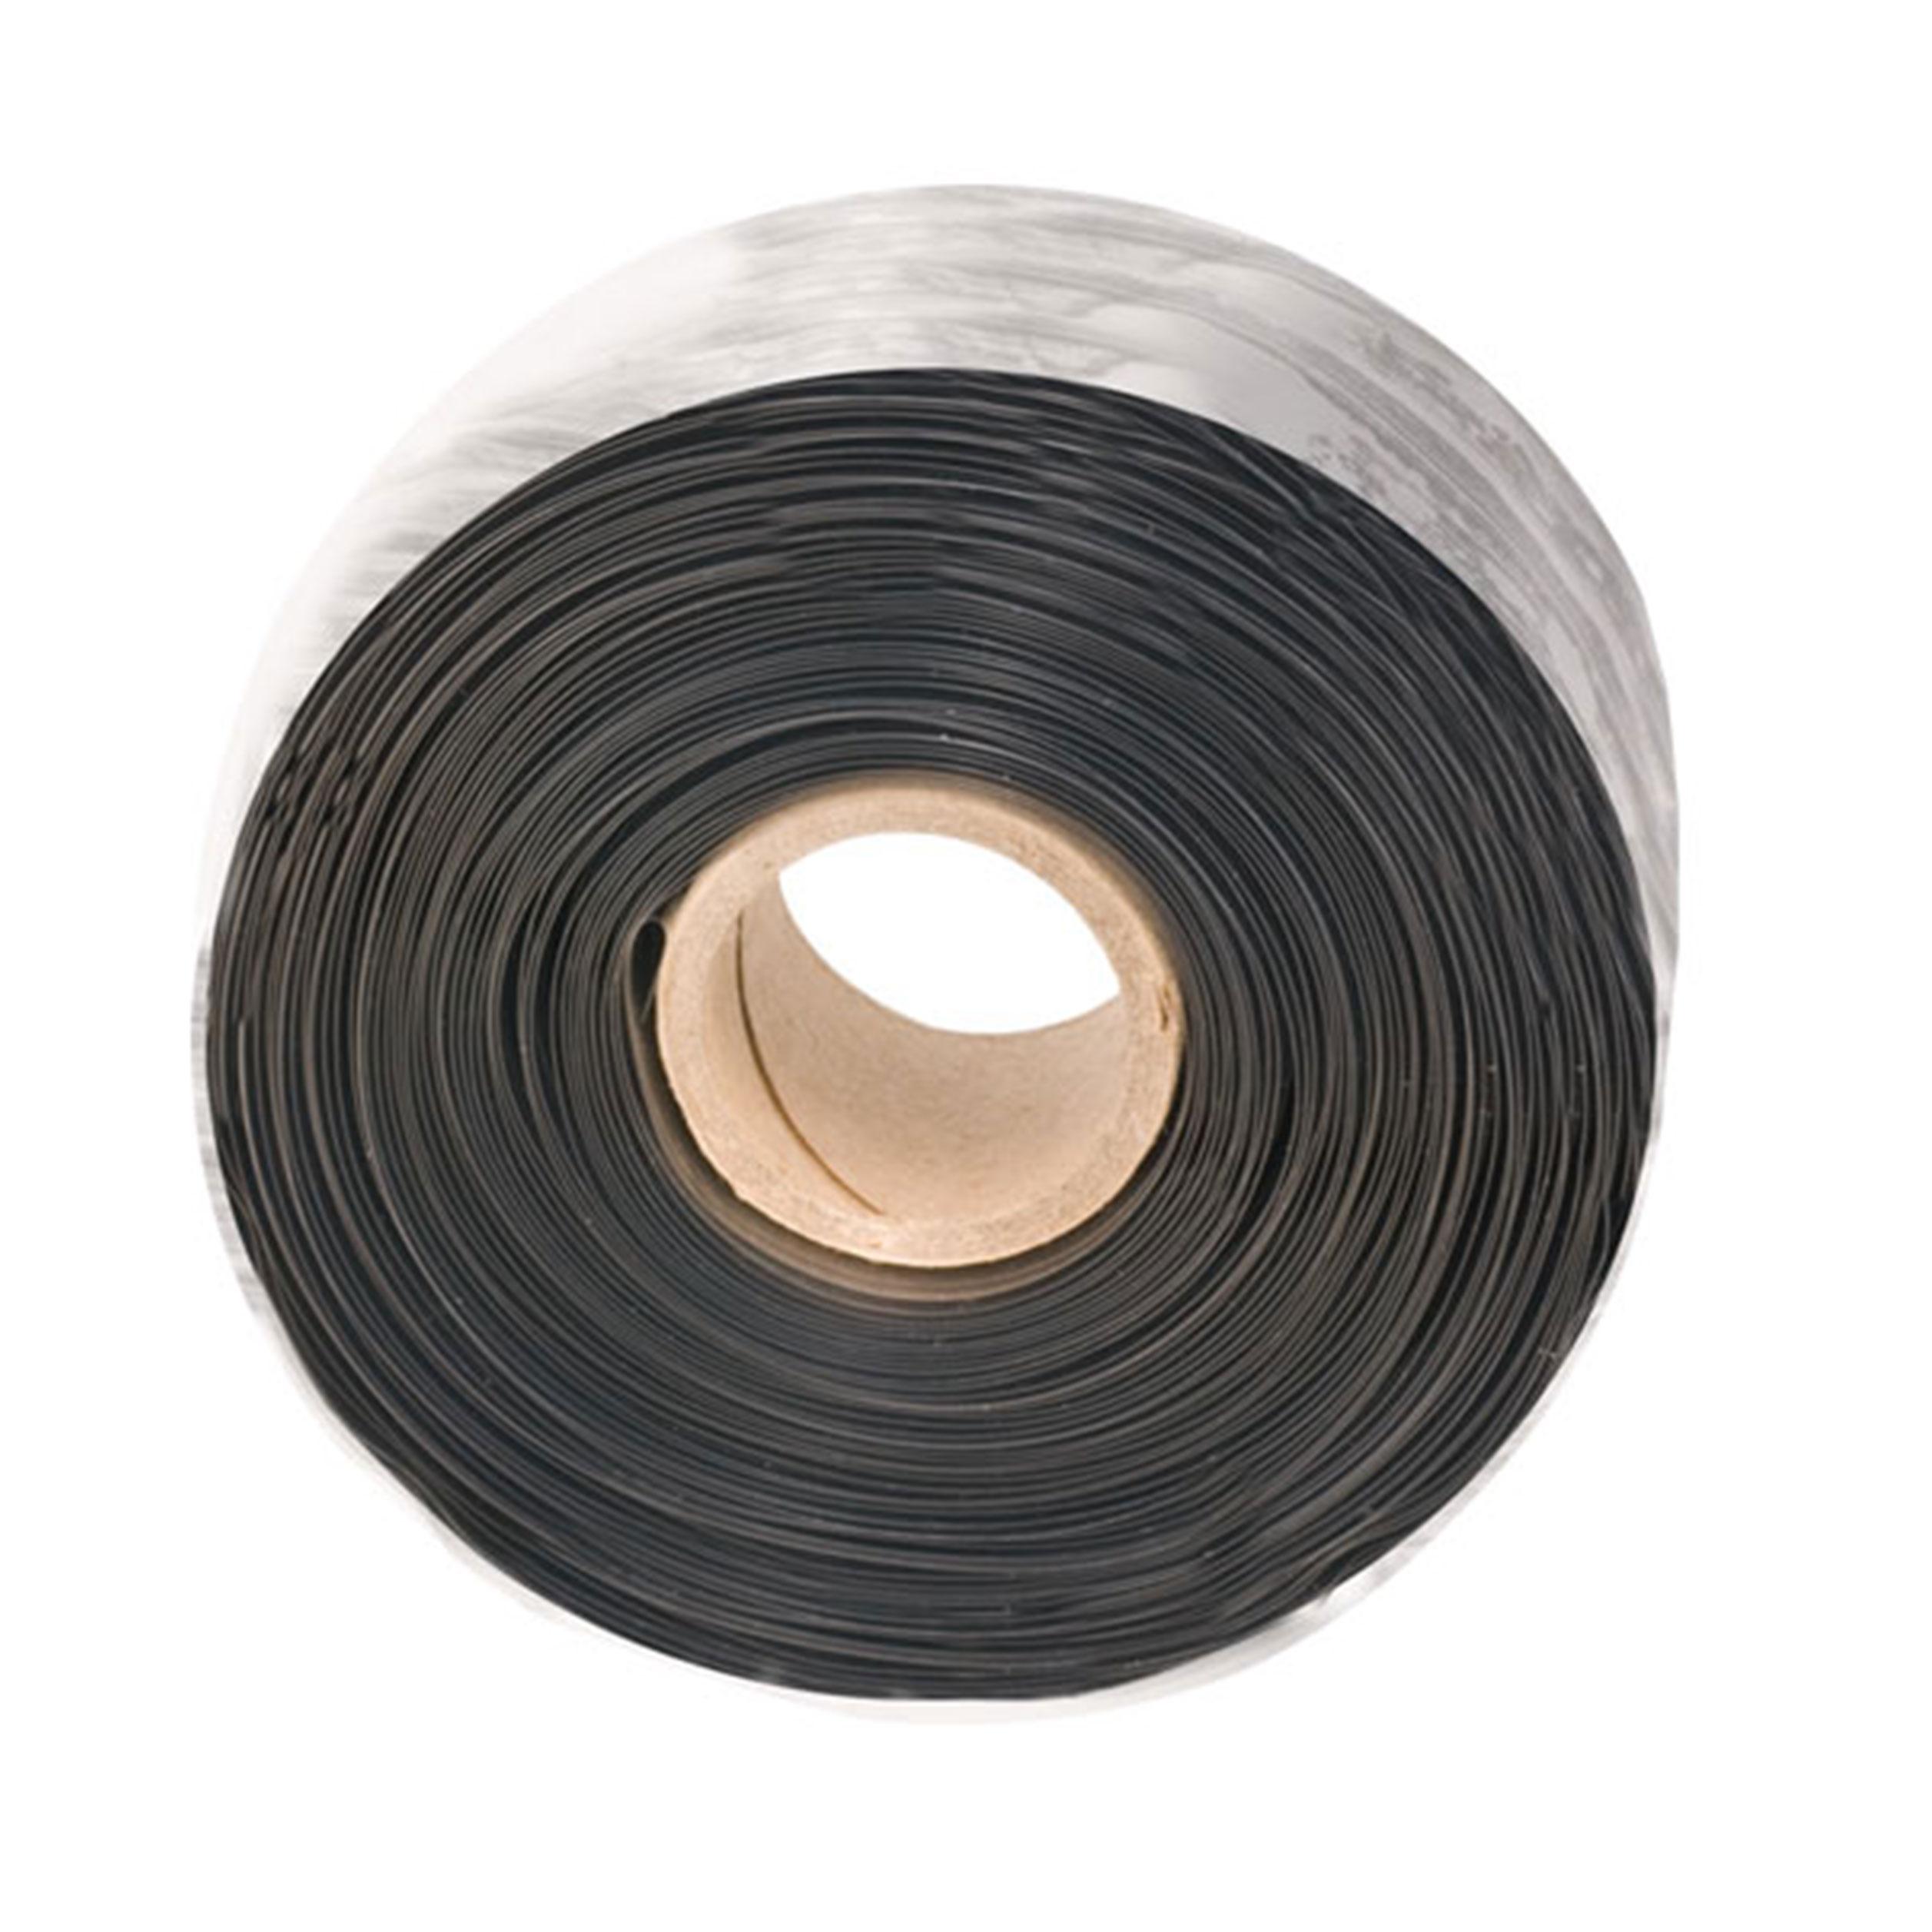 Fireflex® Seal Tape  10 rouleaux x 10.97 m